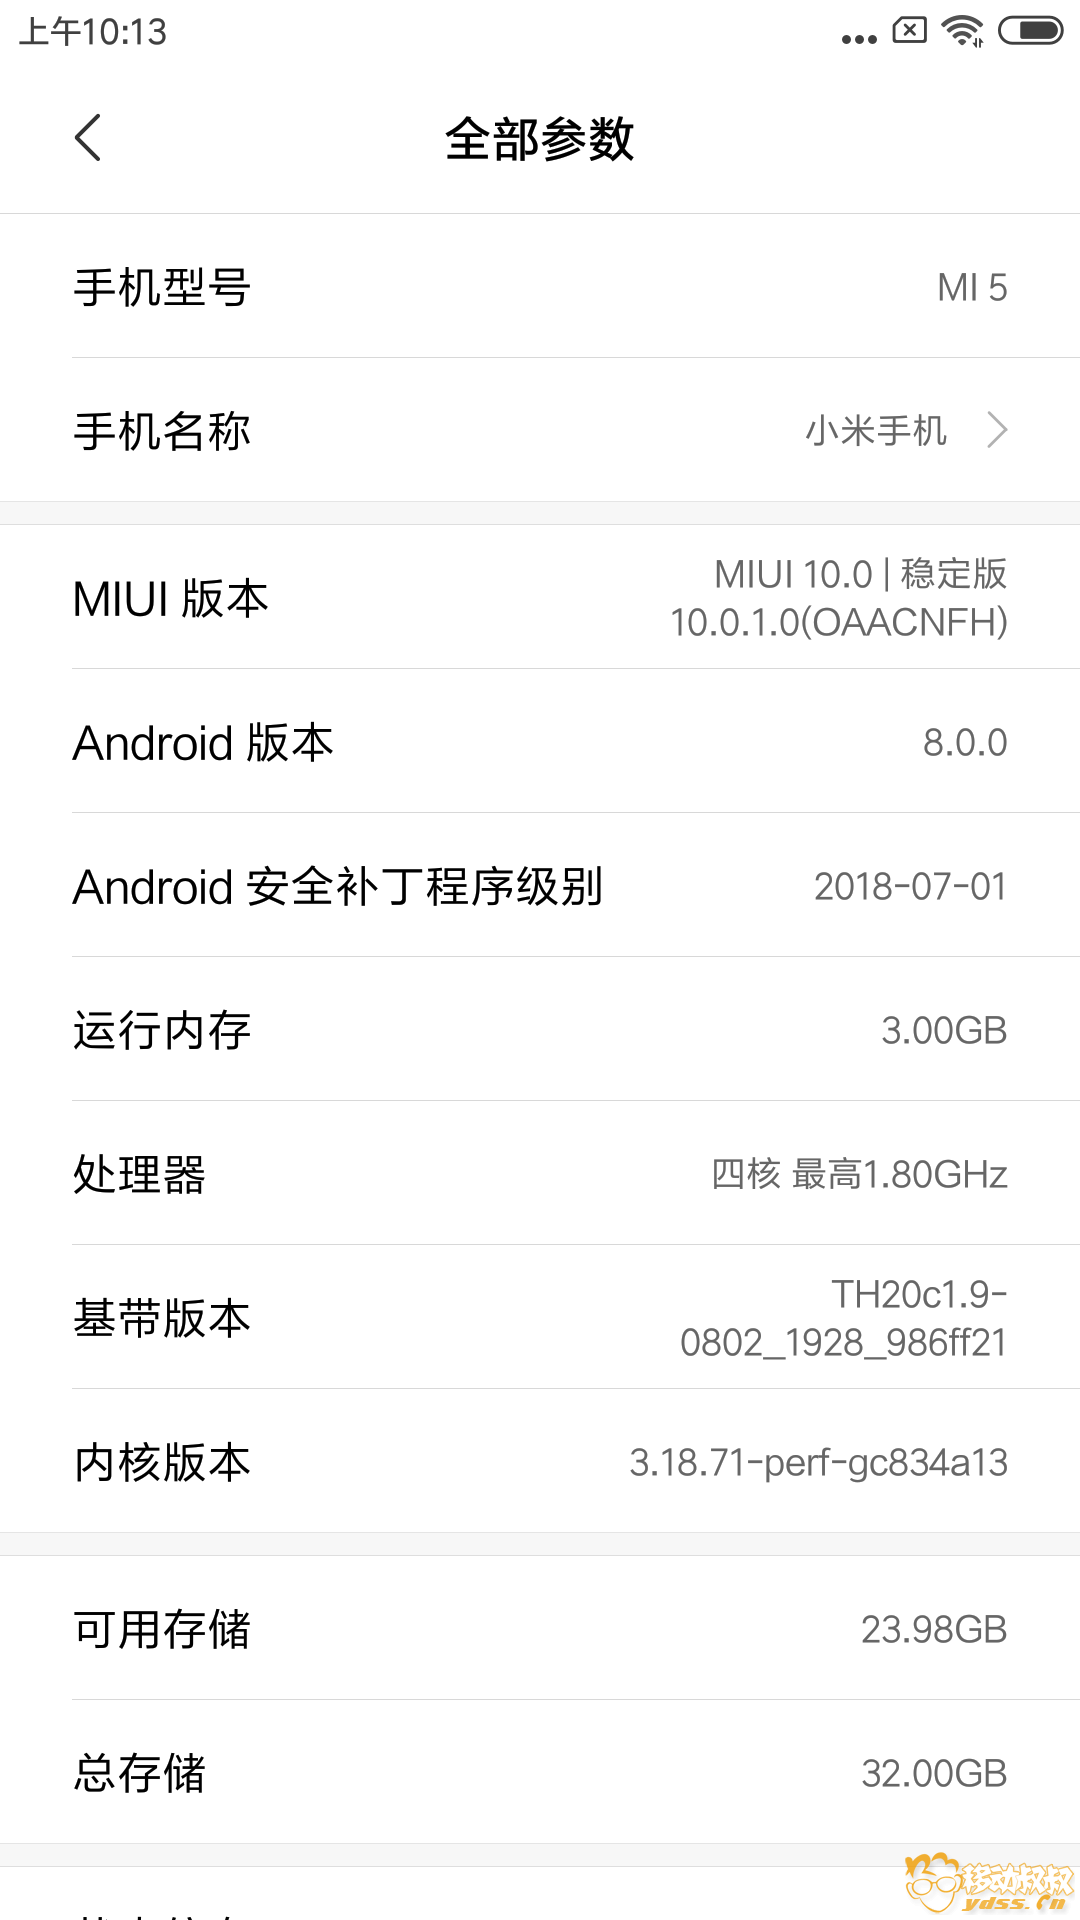 Screenshot_2018-10-06-10-13-15-866_com.android.settings.png